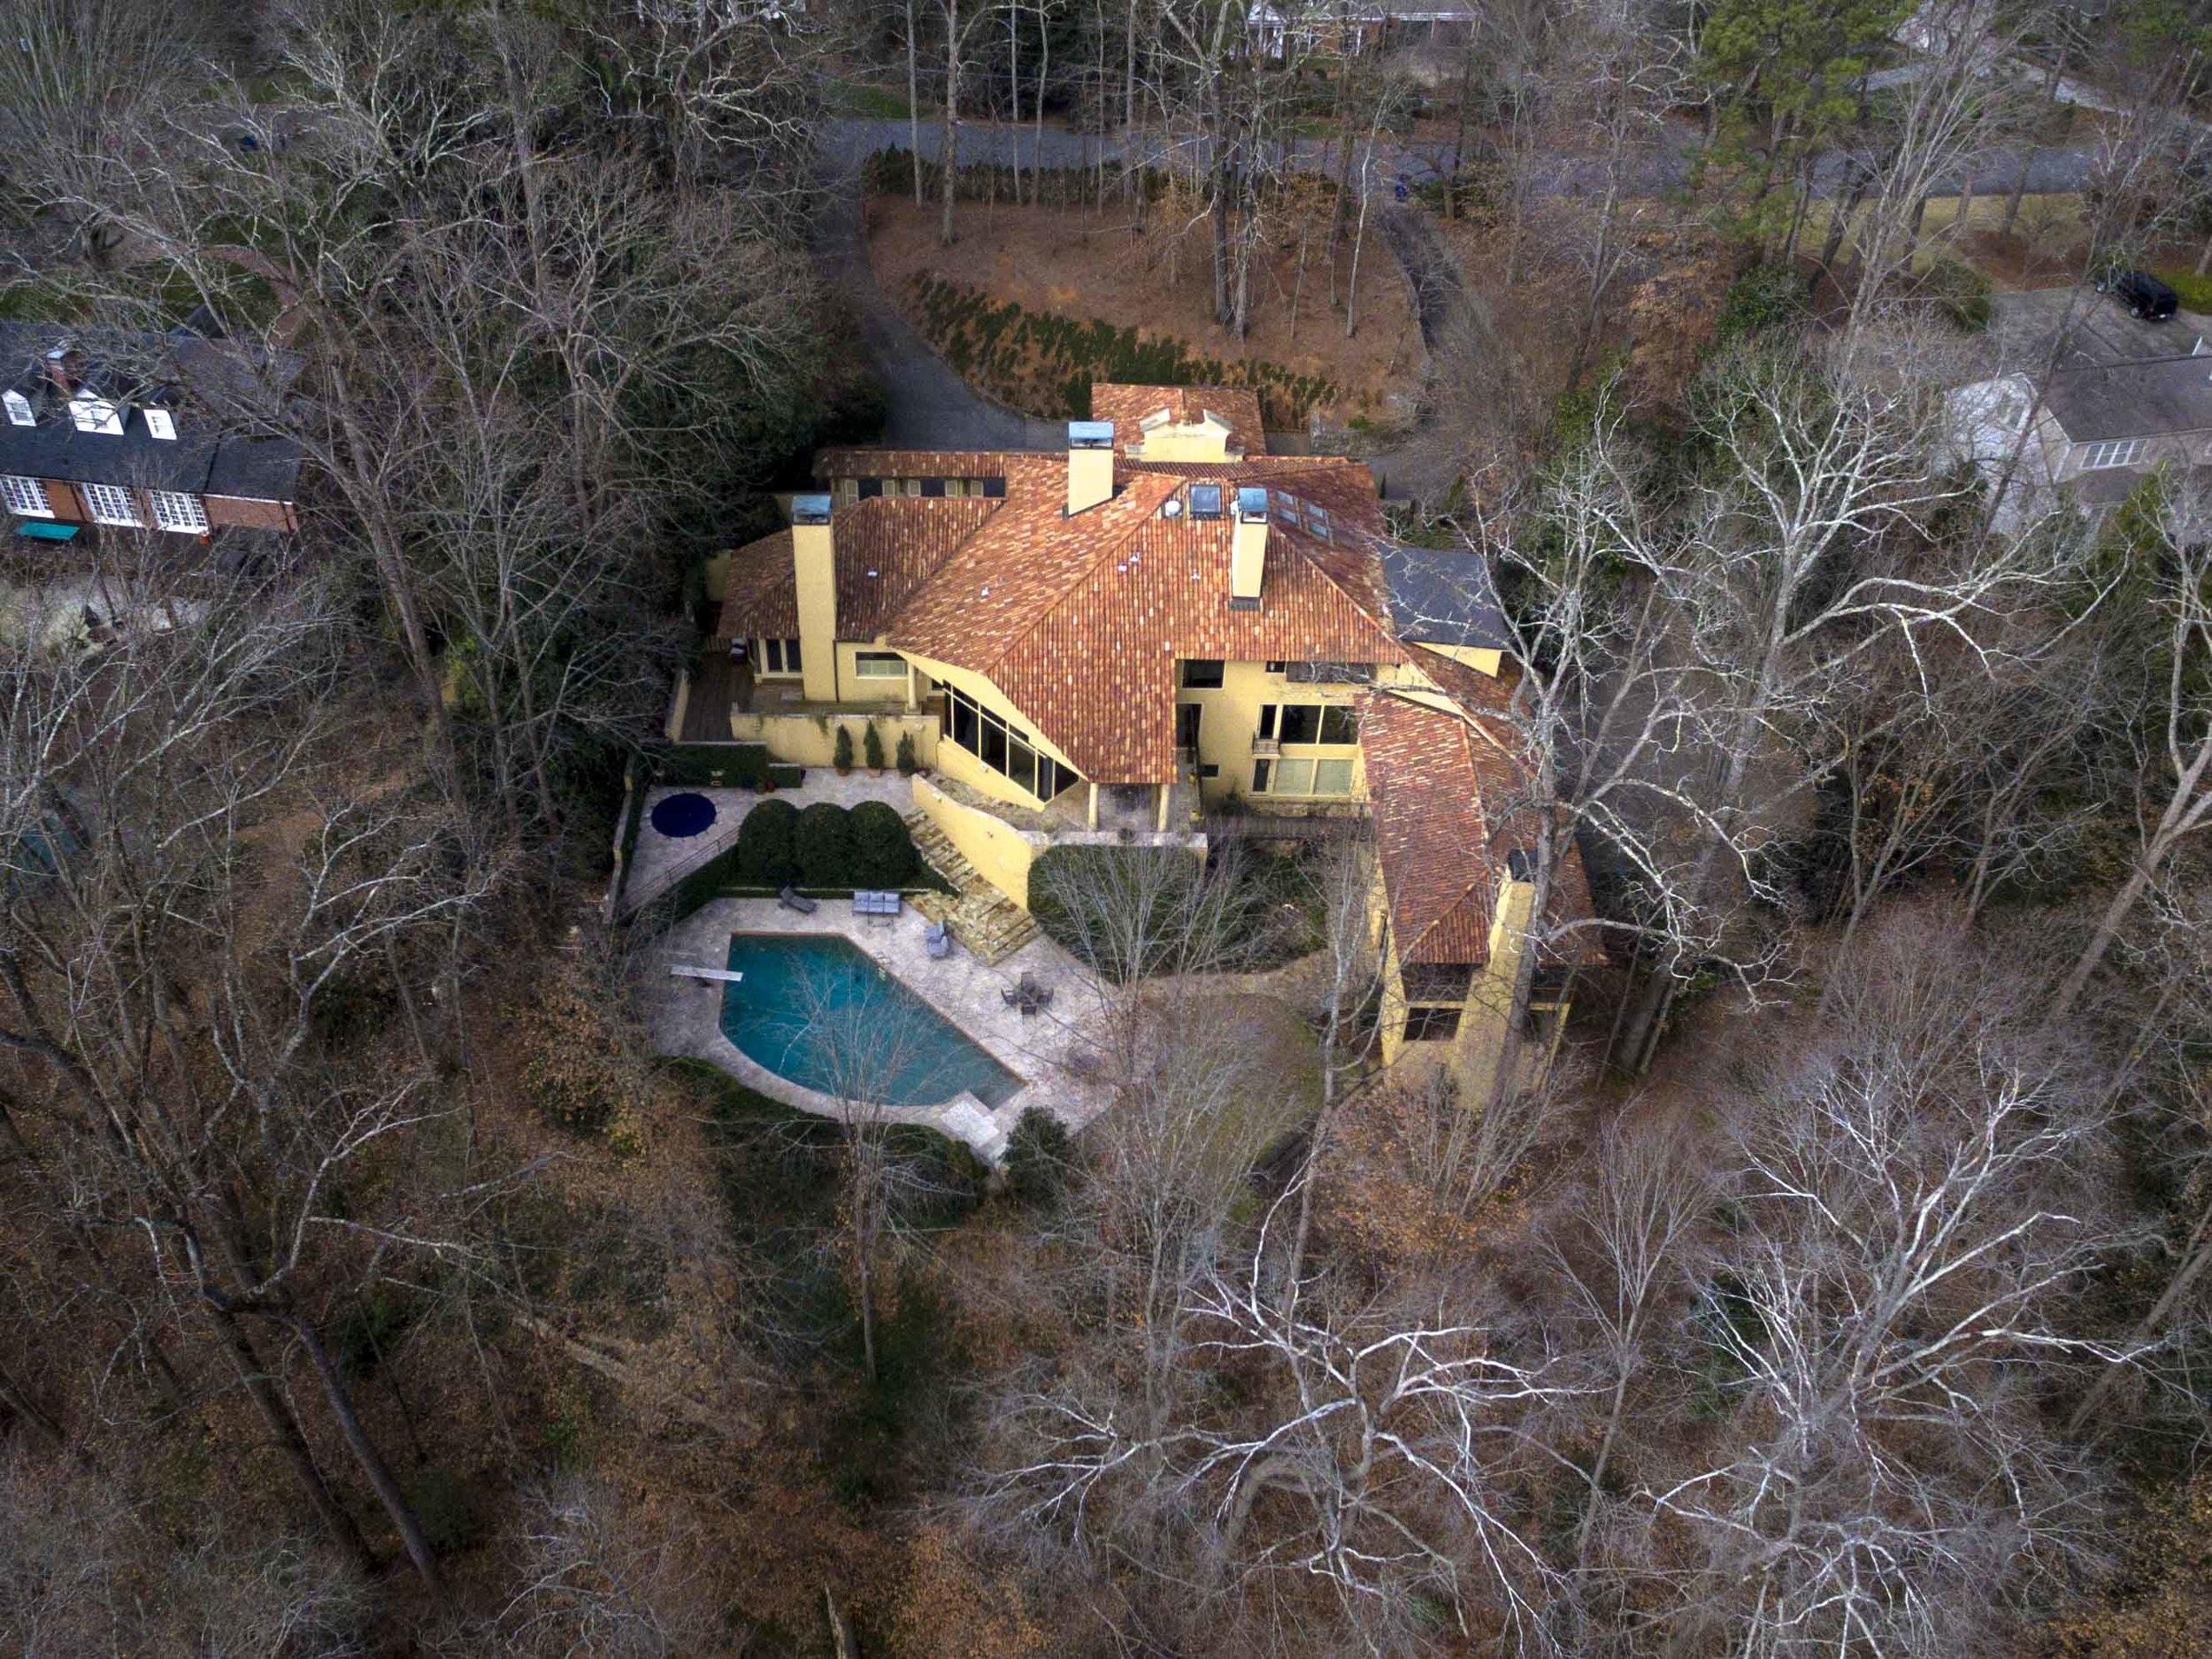 Real Estate Drone Photography Atlanta Georgia North Georgia Drone